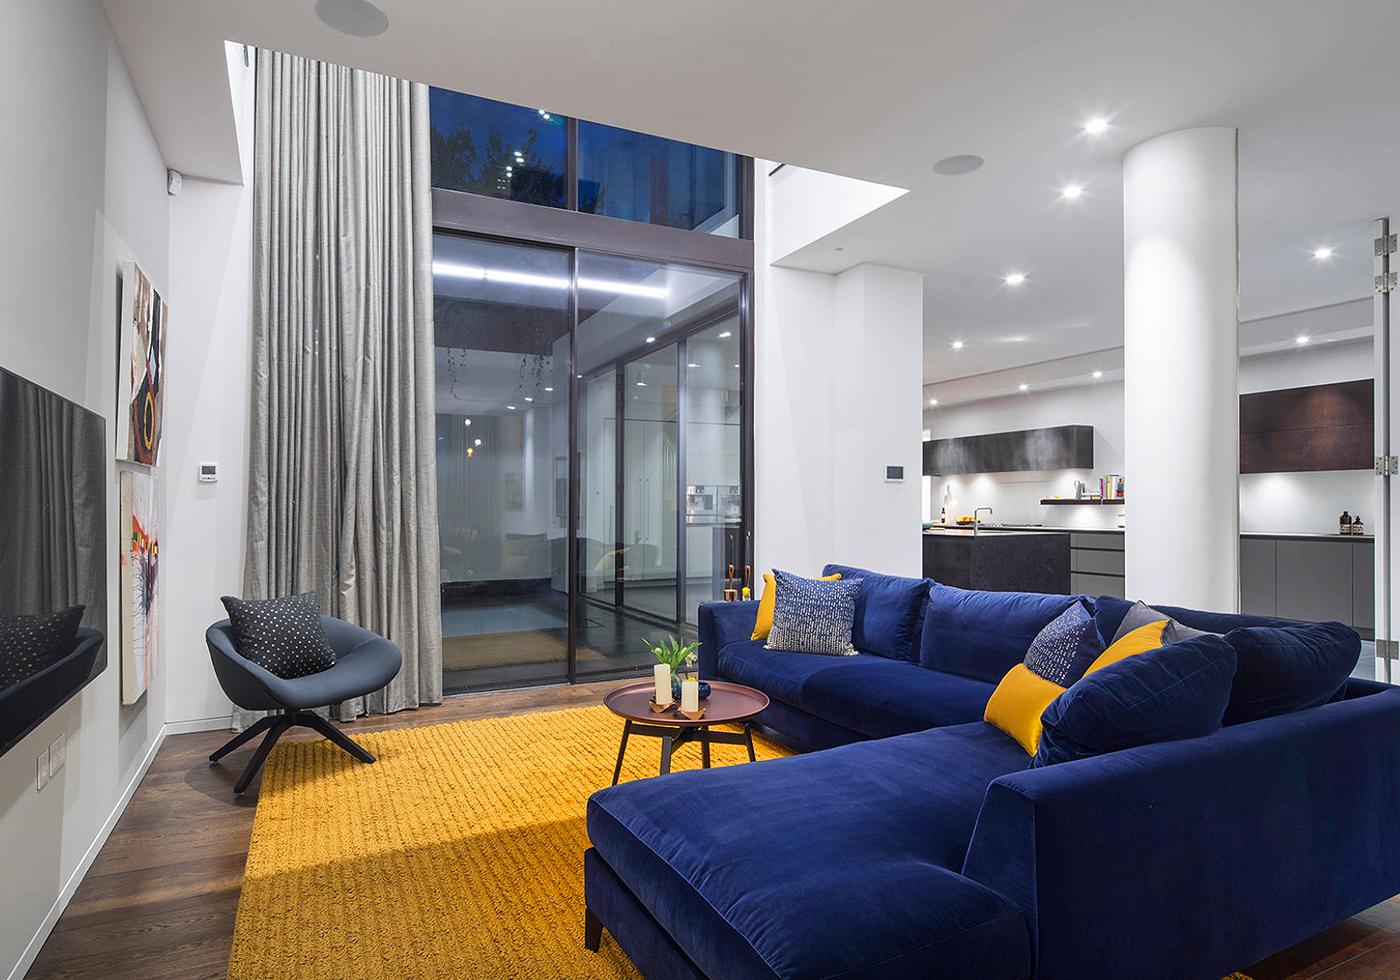 Elegant Navy Blue Modern Style Living Room Decor With Navy